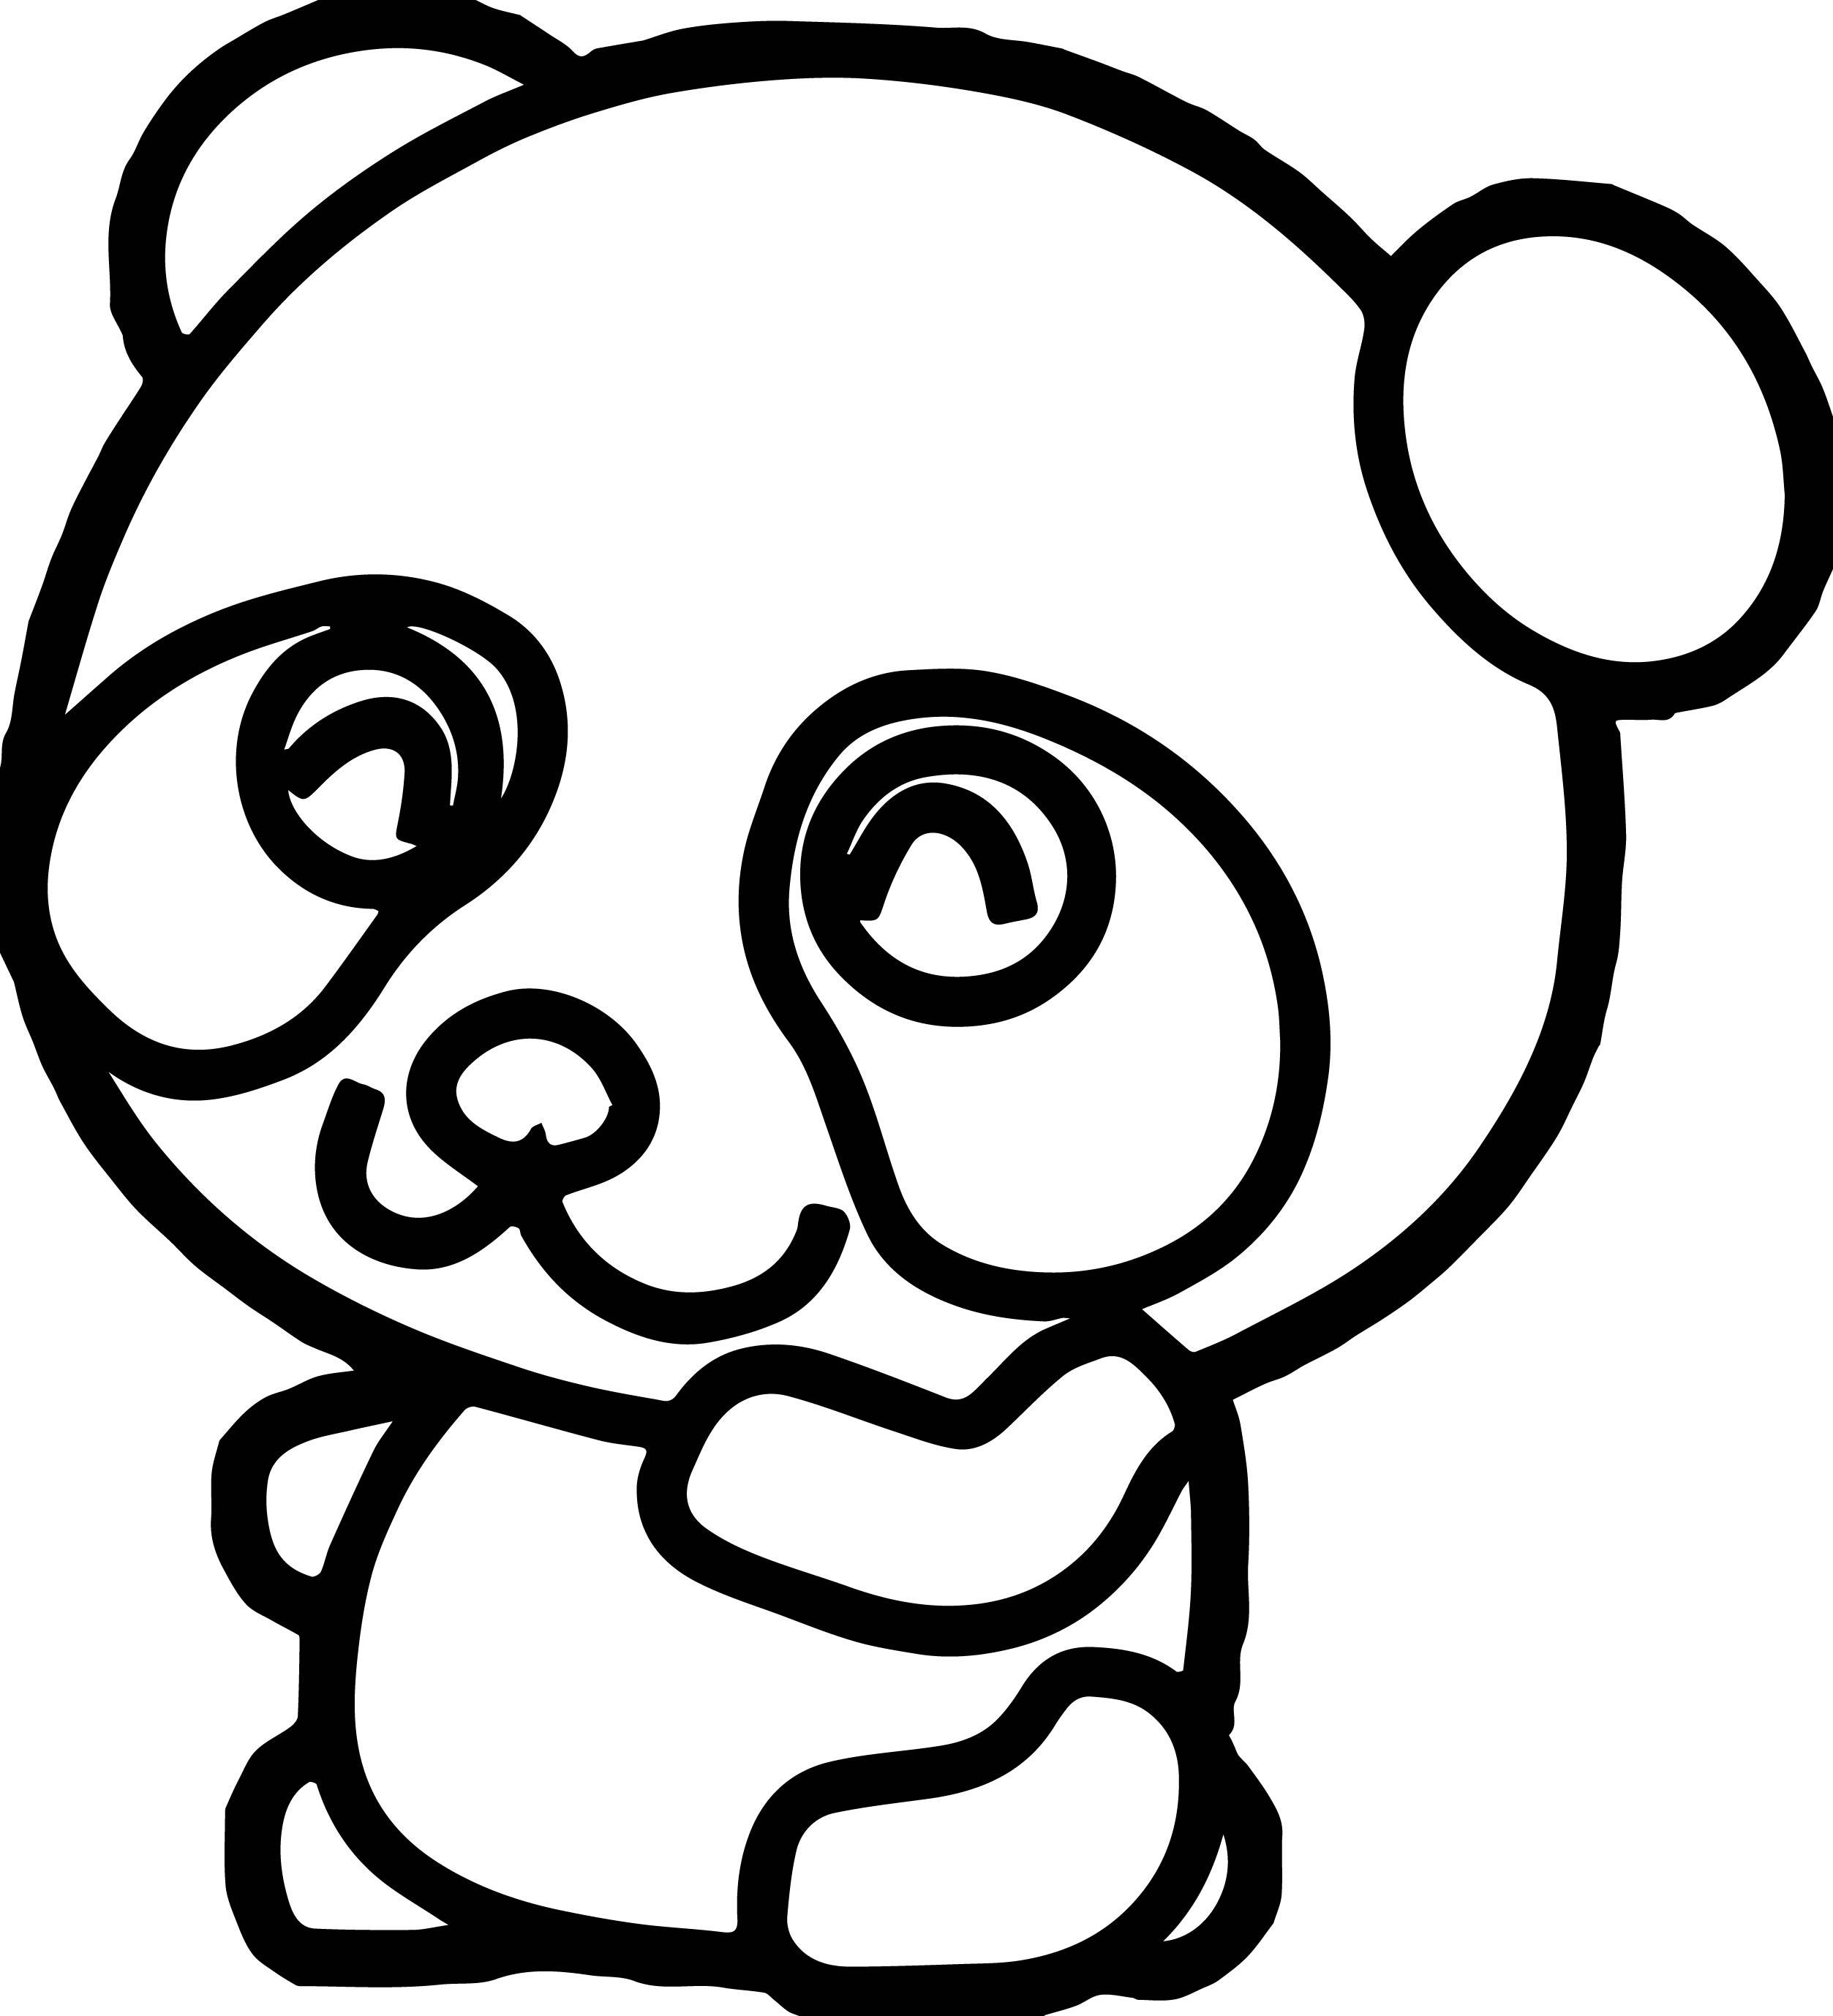 Panda Bears Drawing at GetDrawings.com   Free for personal use Panda ...